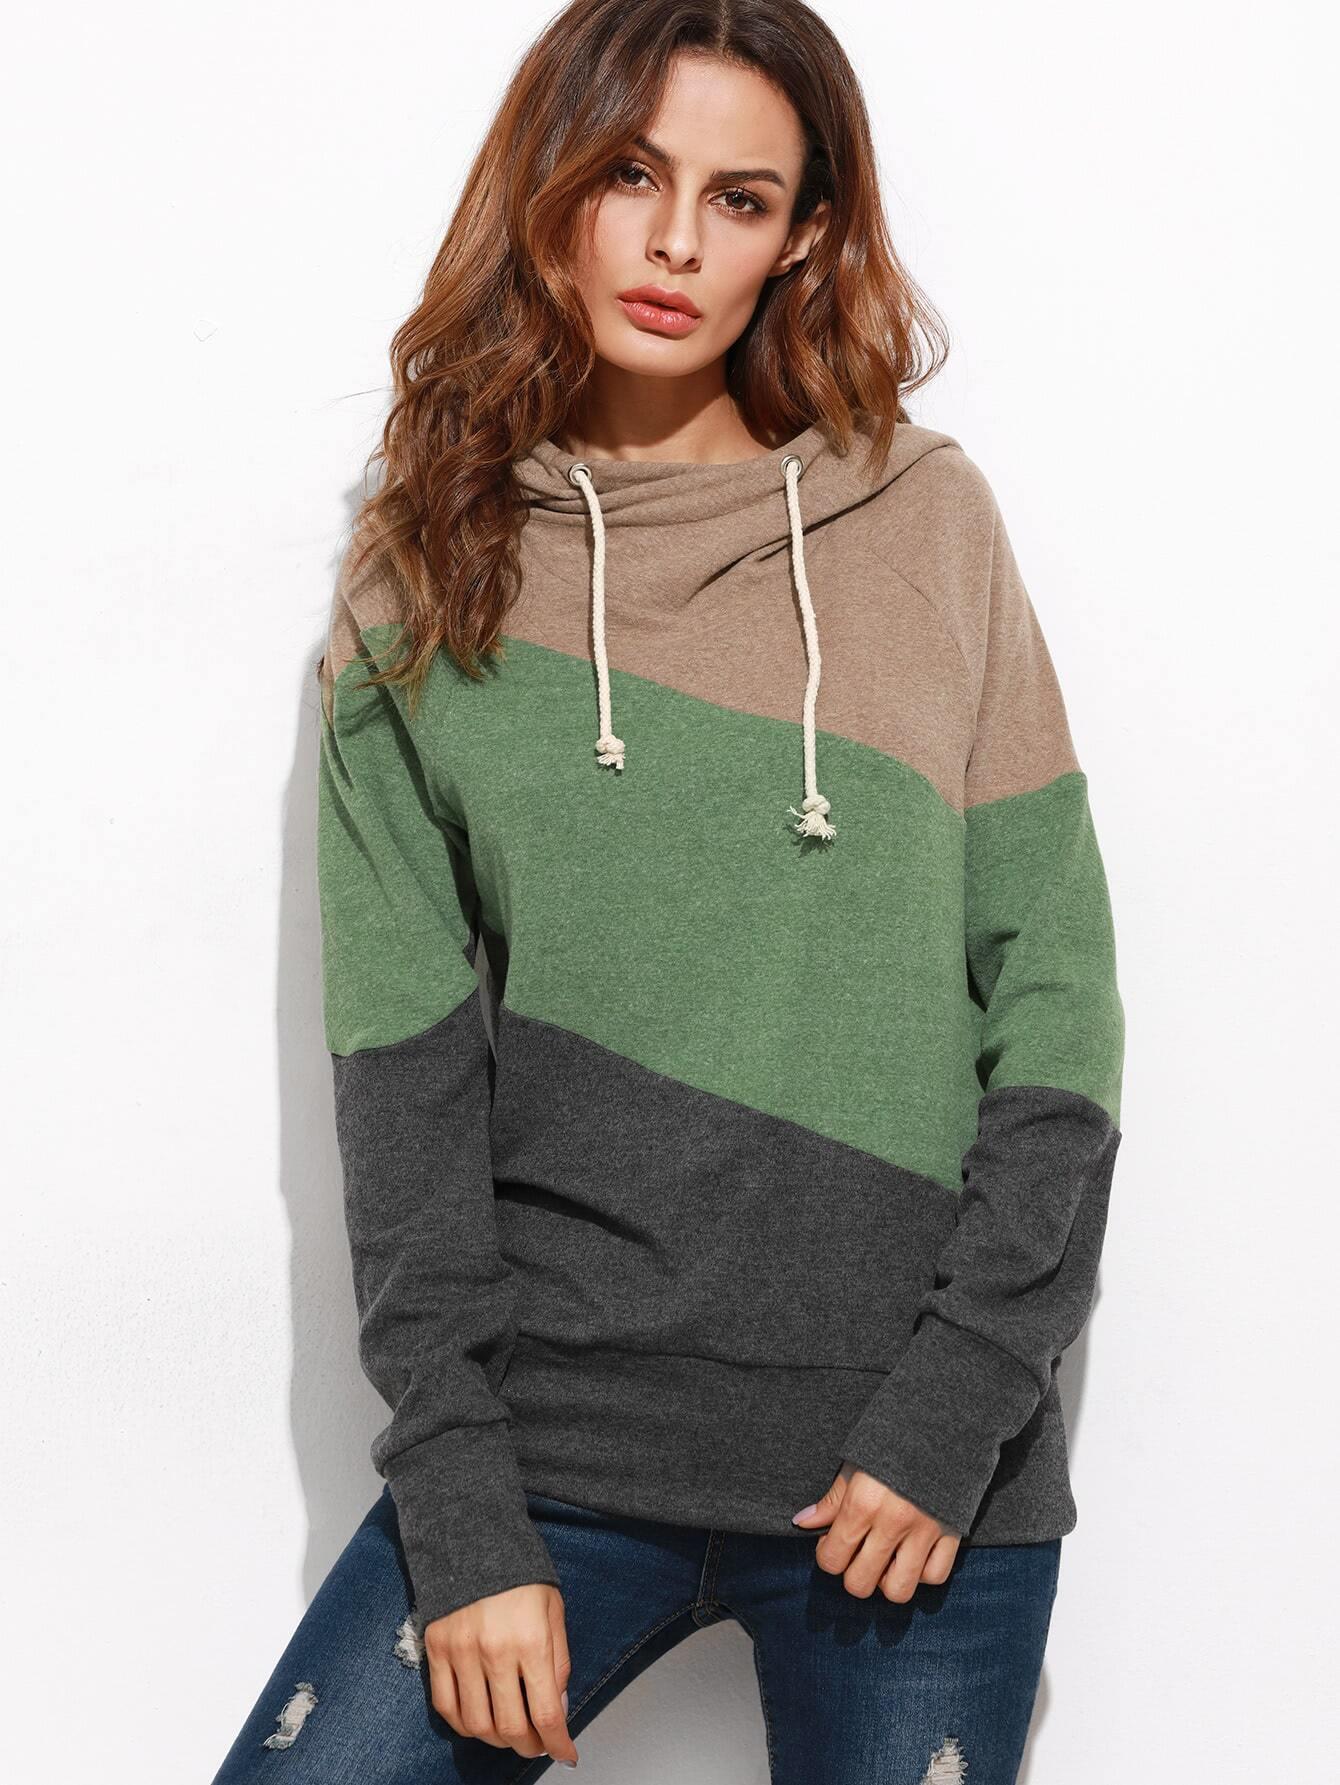 Color Block Raglan Sleeve Hooded SweatshirtColor Block Raglan Sleeve Hooded Sweatshirt<br><br>color: Multicolor<br>size: L,M,S,XS